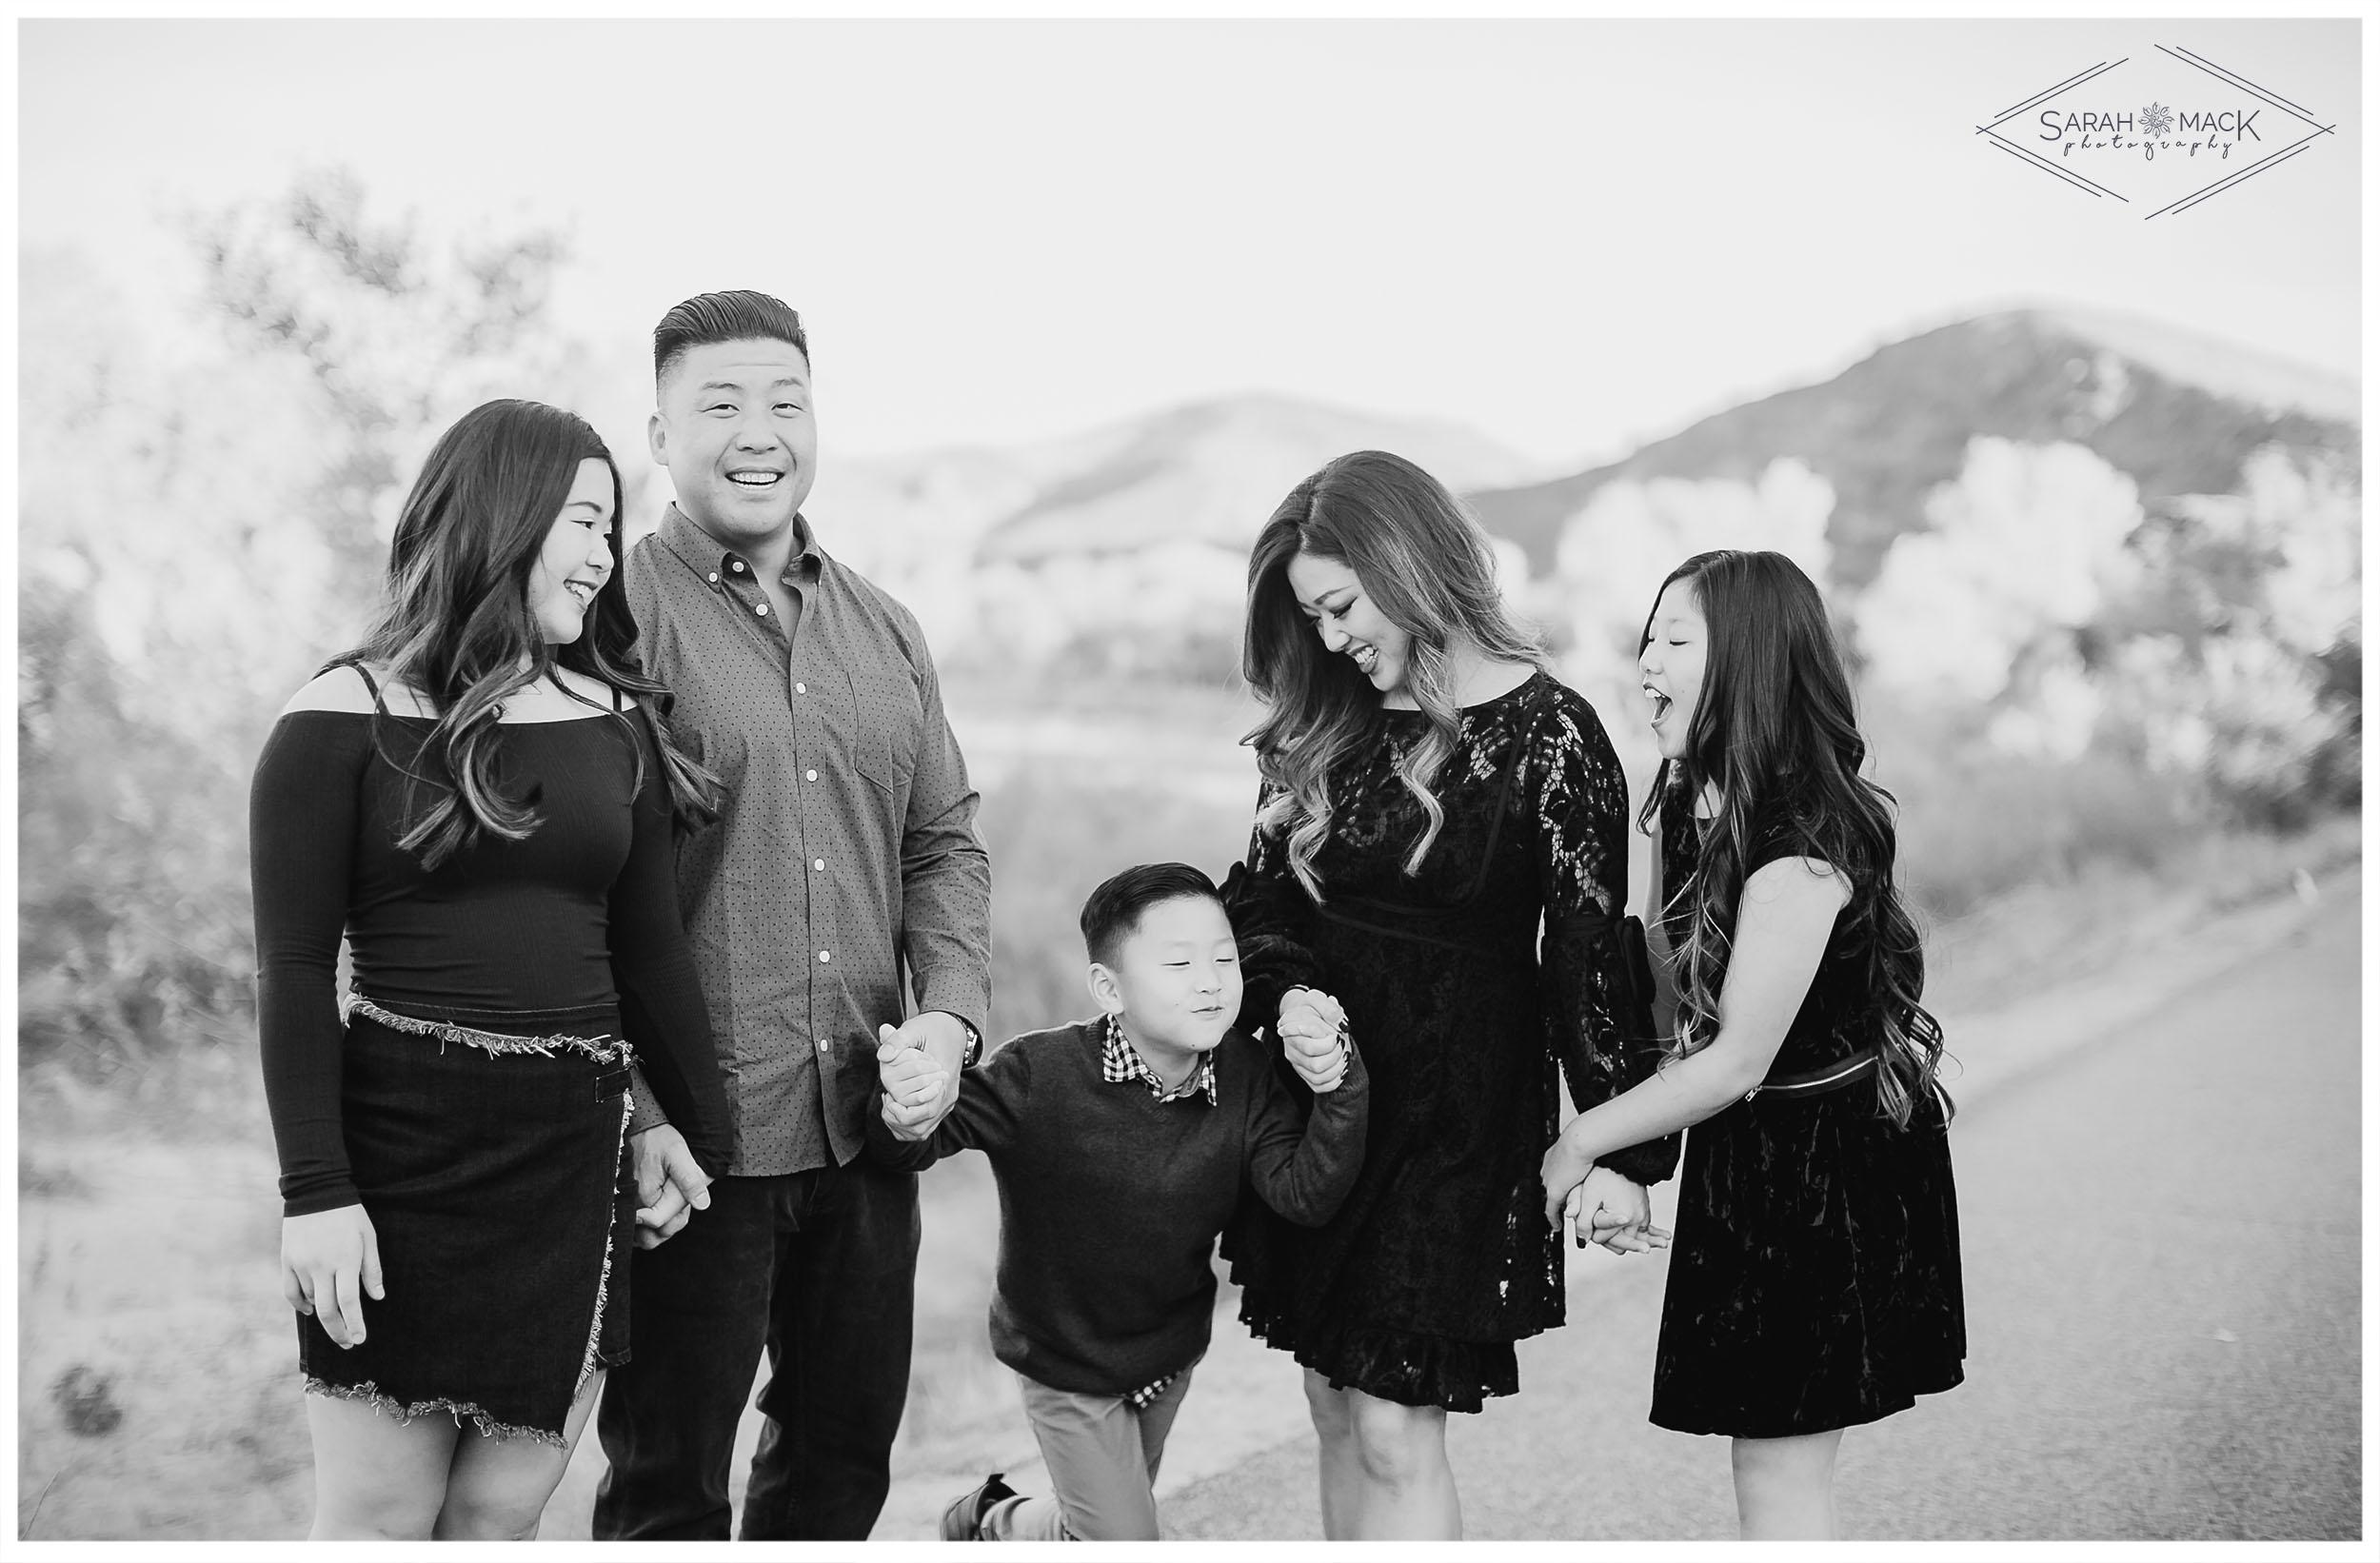 C-Irvine-Regional-Park-Family-Photography-8.jpg